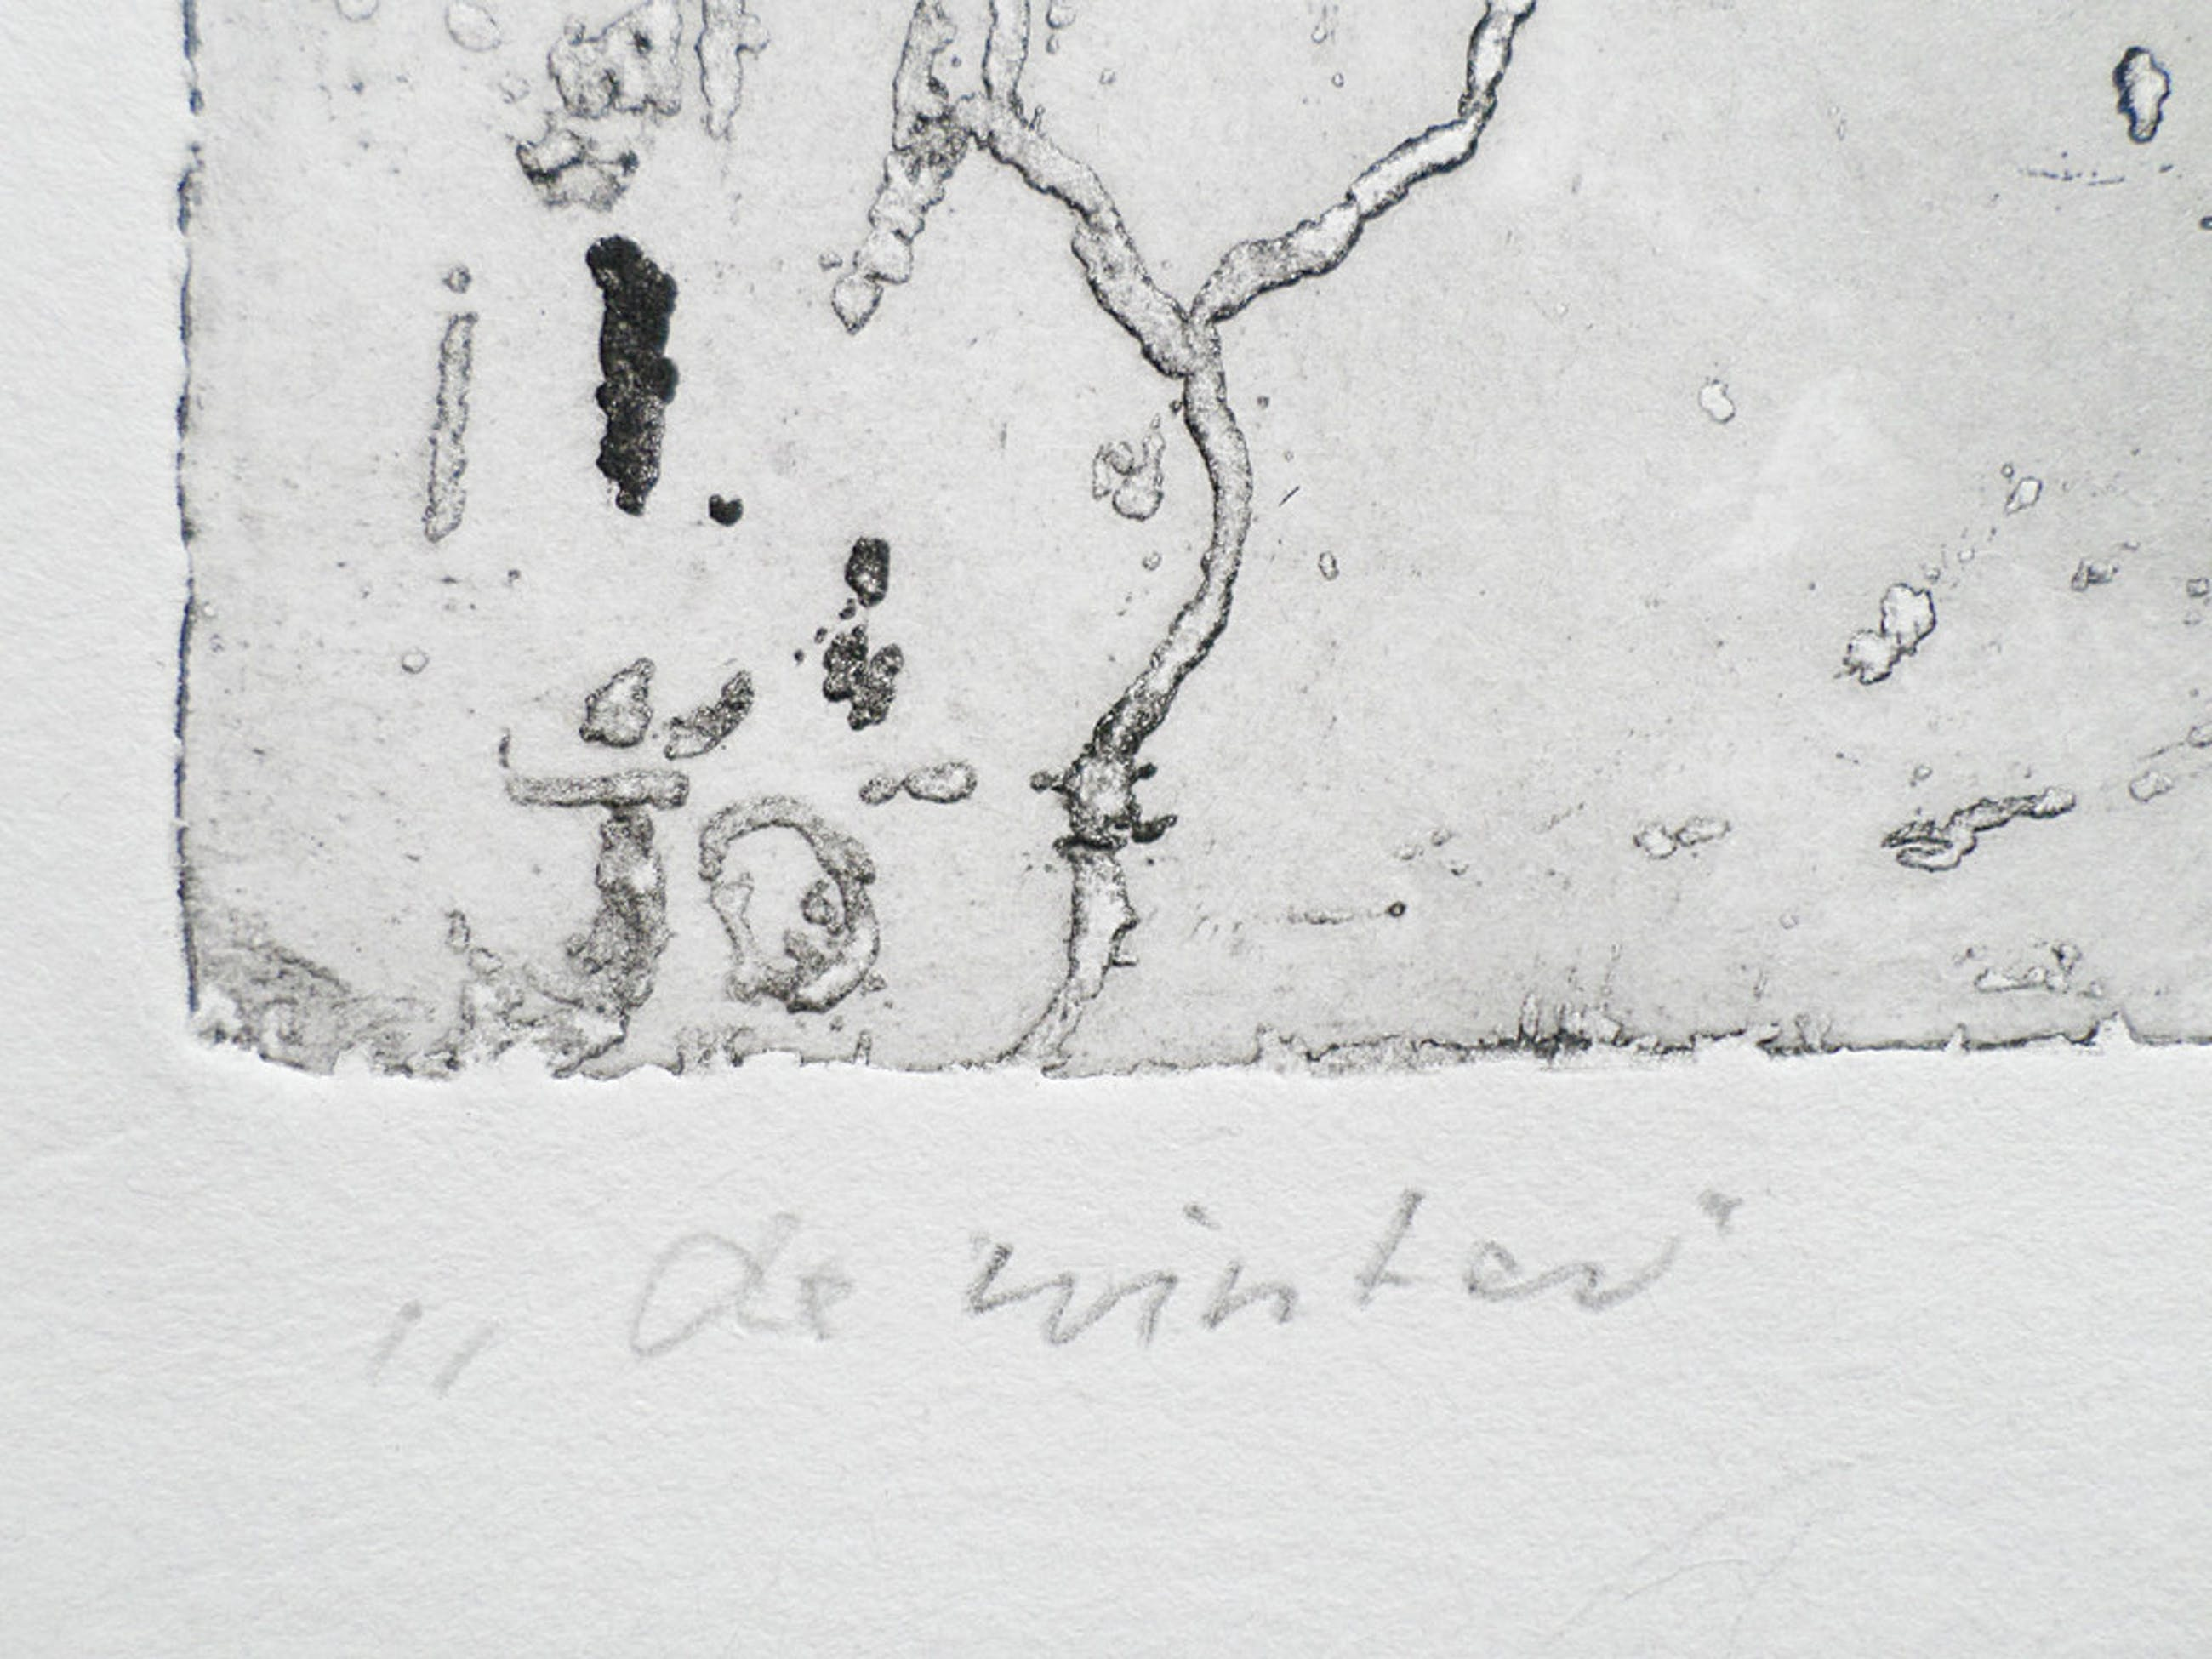 Jeanne Bieruma Oosting - De winter, ets kopen? Bied vanaf 100!